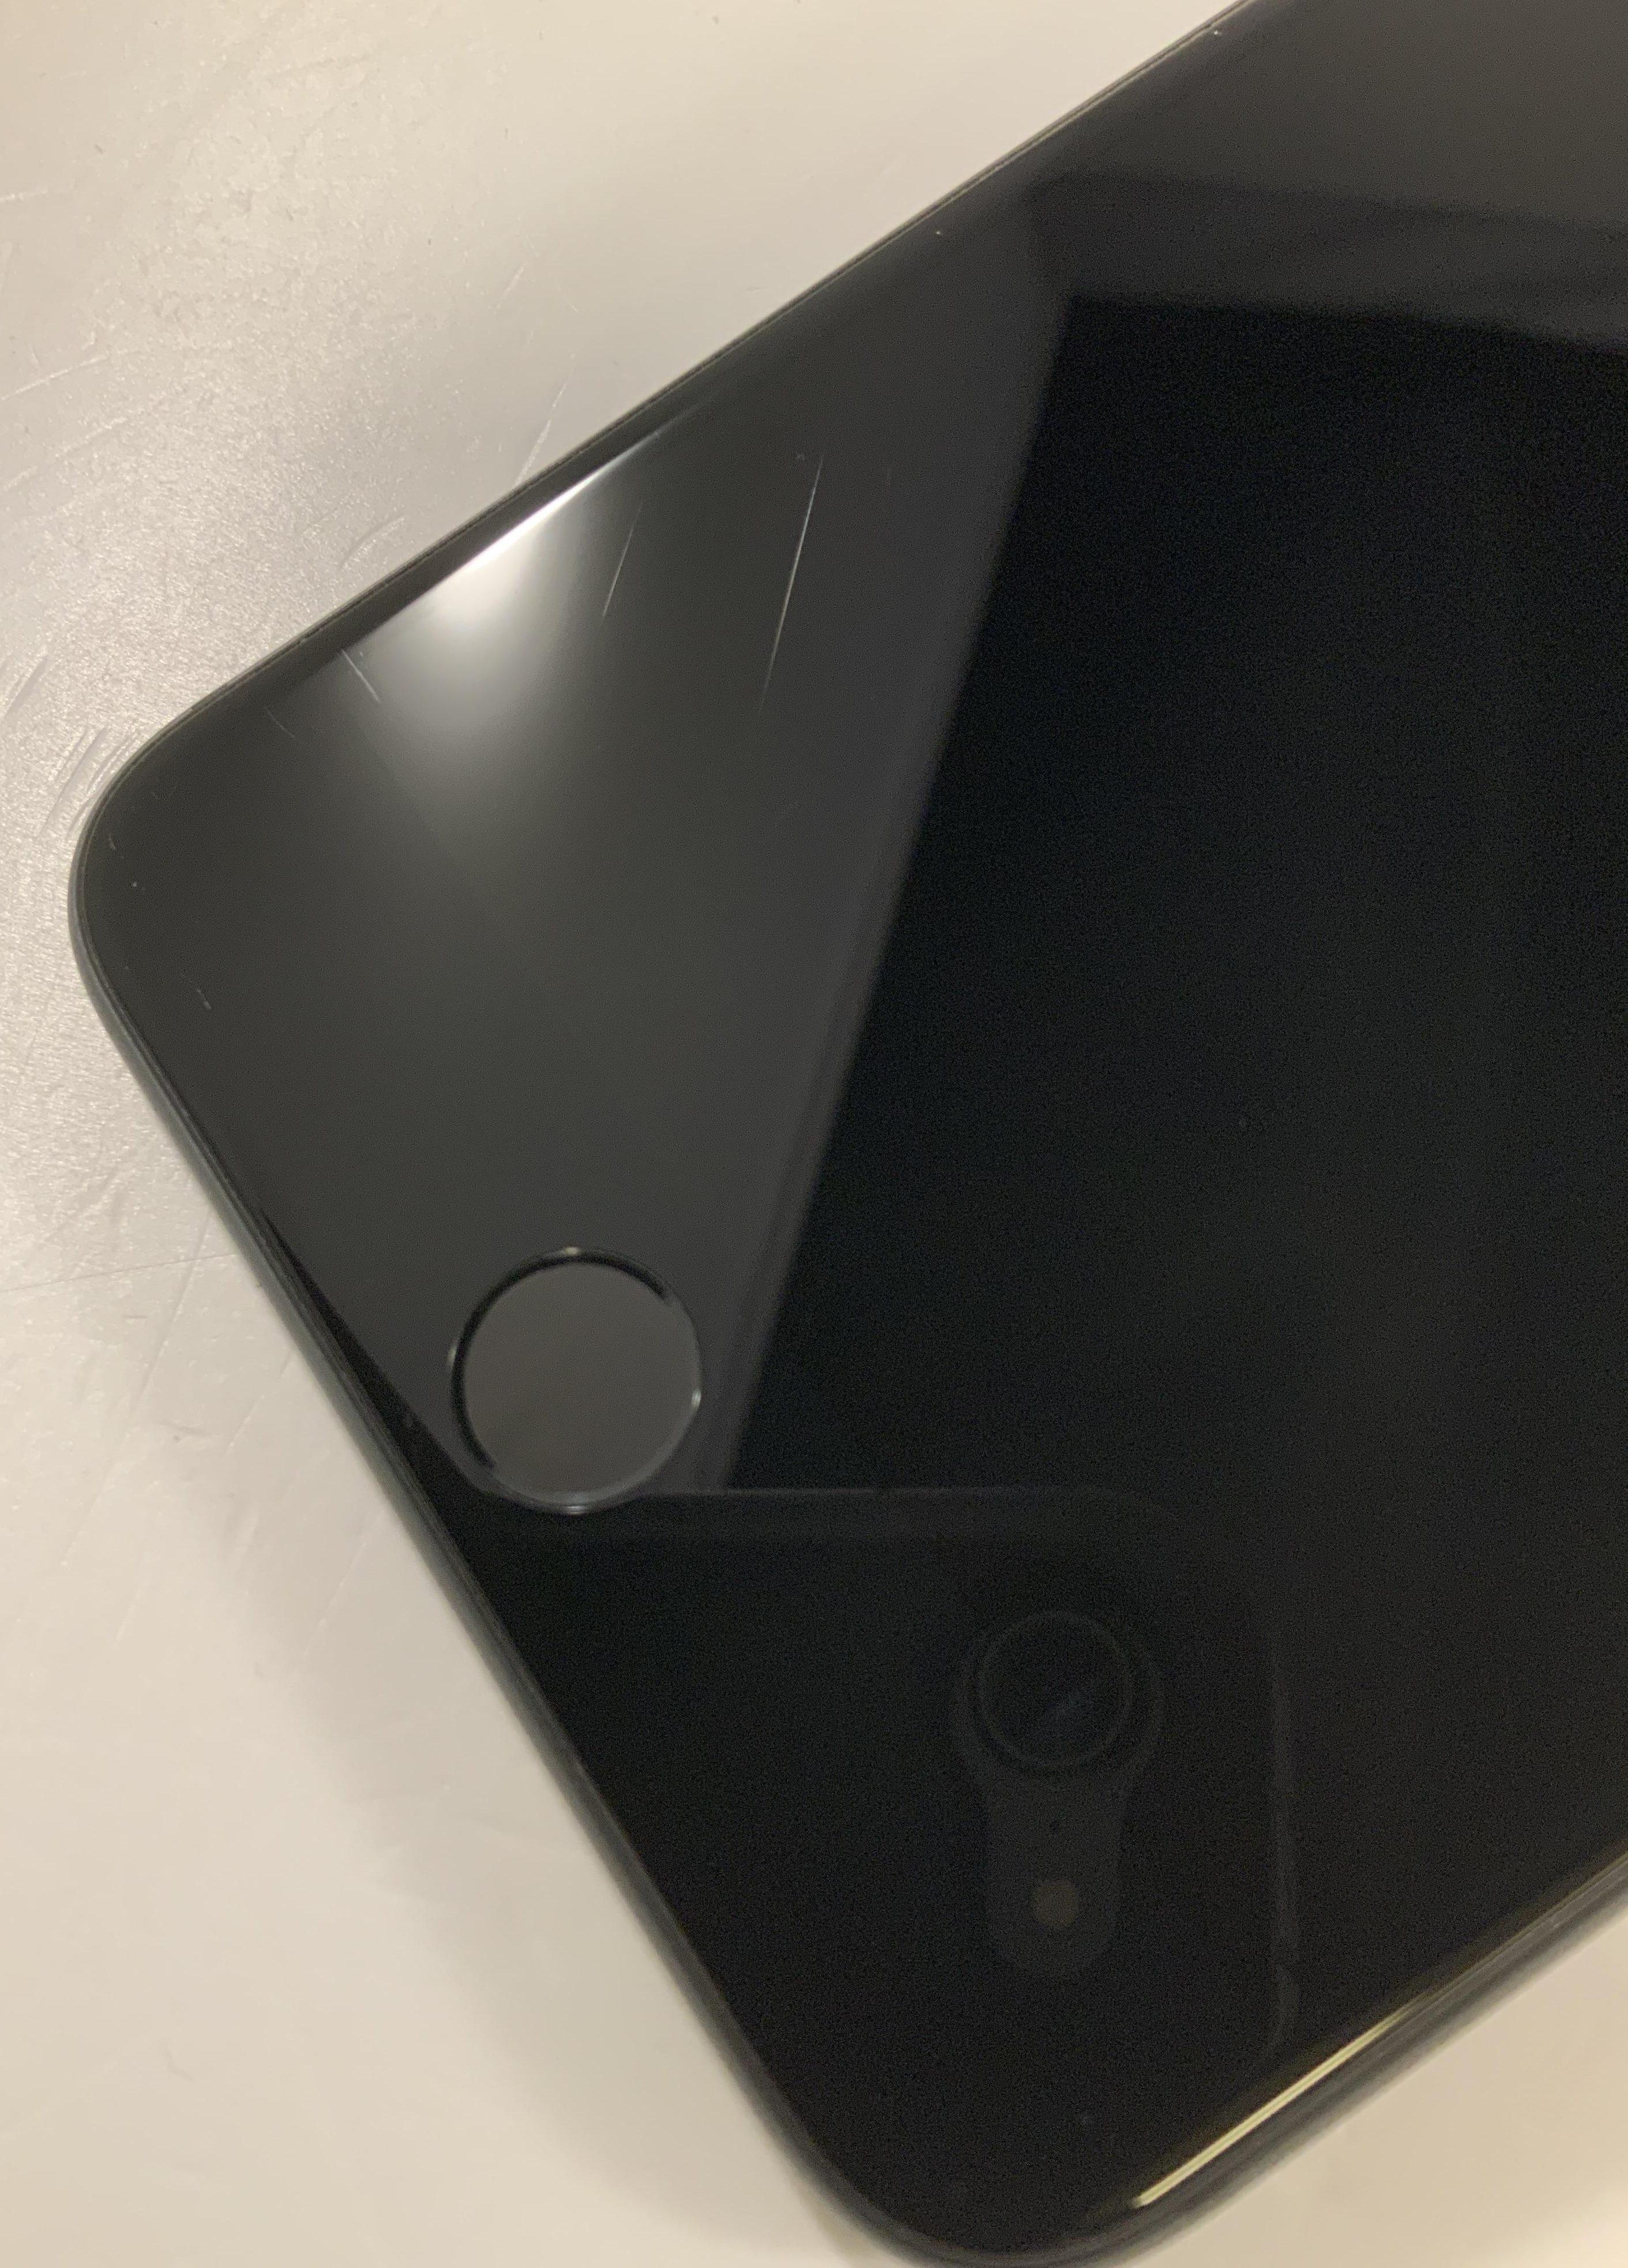 iPhone 8 Plus 256GB, 256GB, Space Gray, Kuva 4